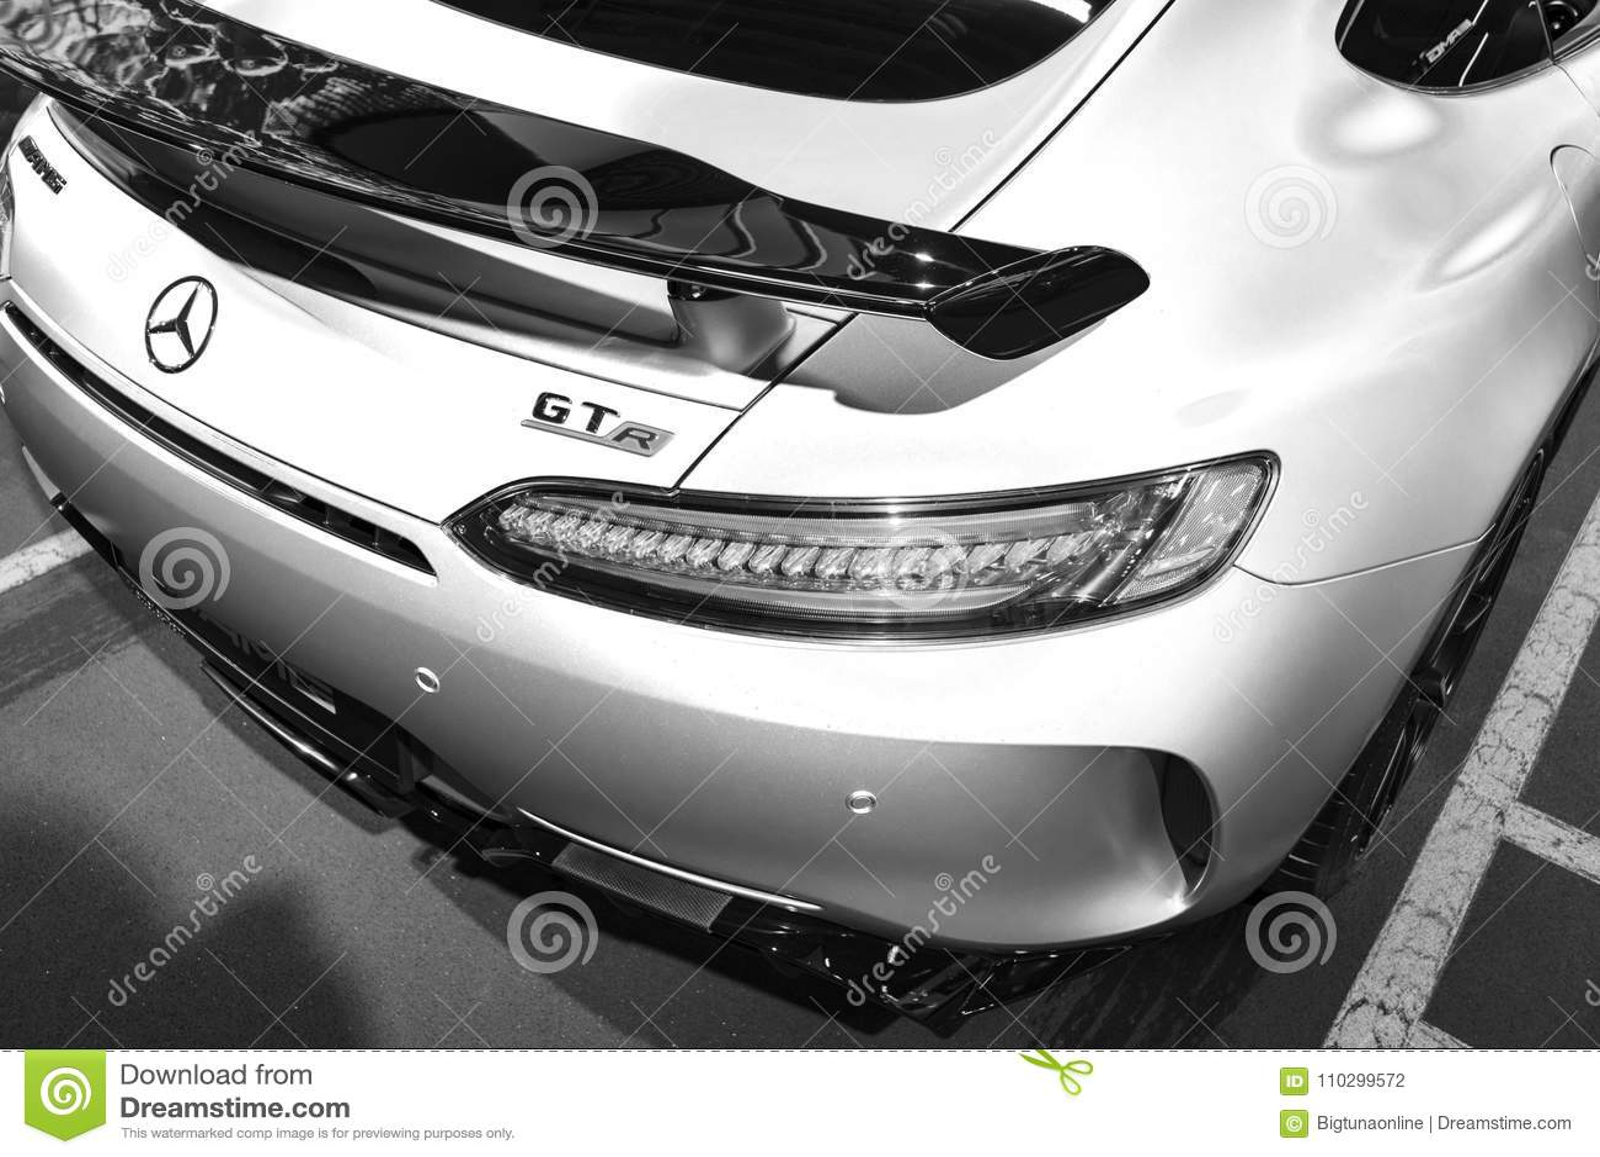 Mercedes Benz Amg Gtr 2018 V8 Bi Turbo Exterior Details Back View